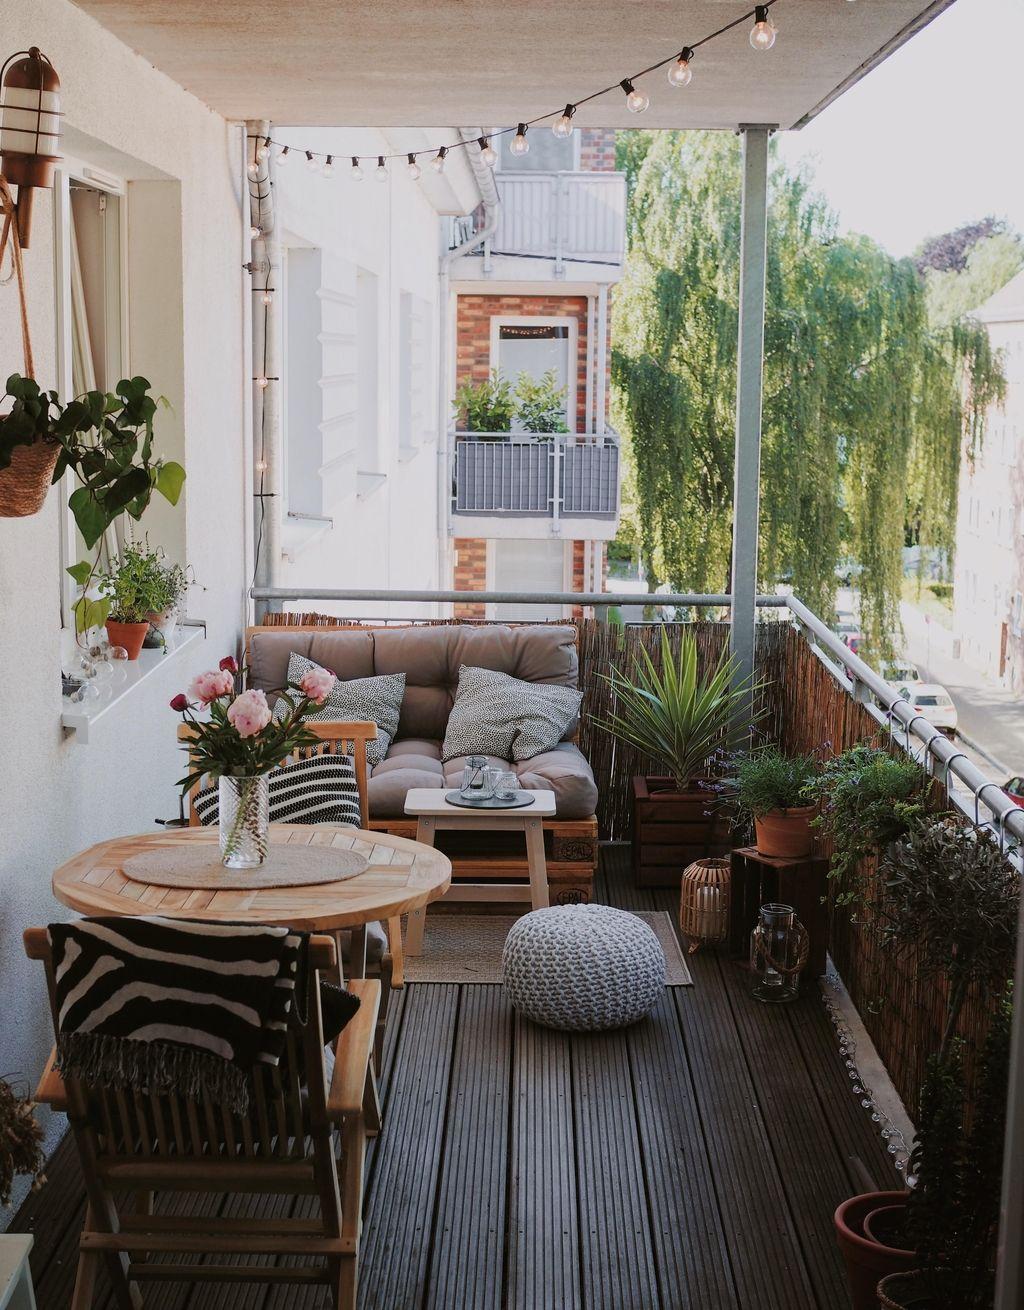 my happy place 🌱  balkonien  outdoorweek  balkon  pa...